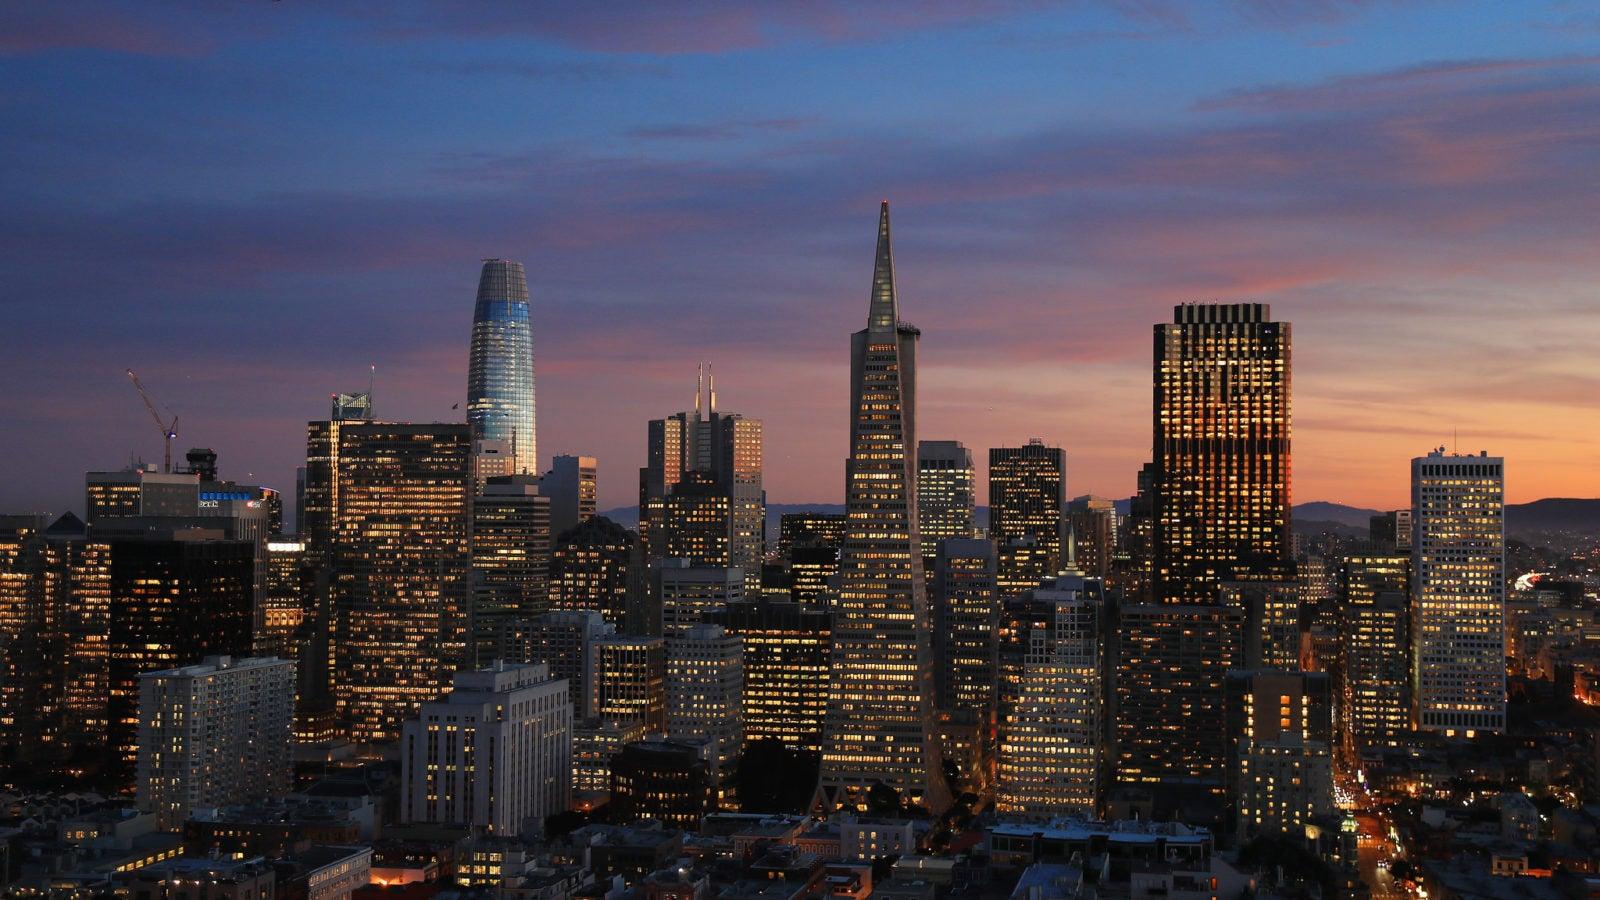 Skyline of San Francisco.